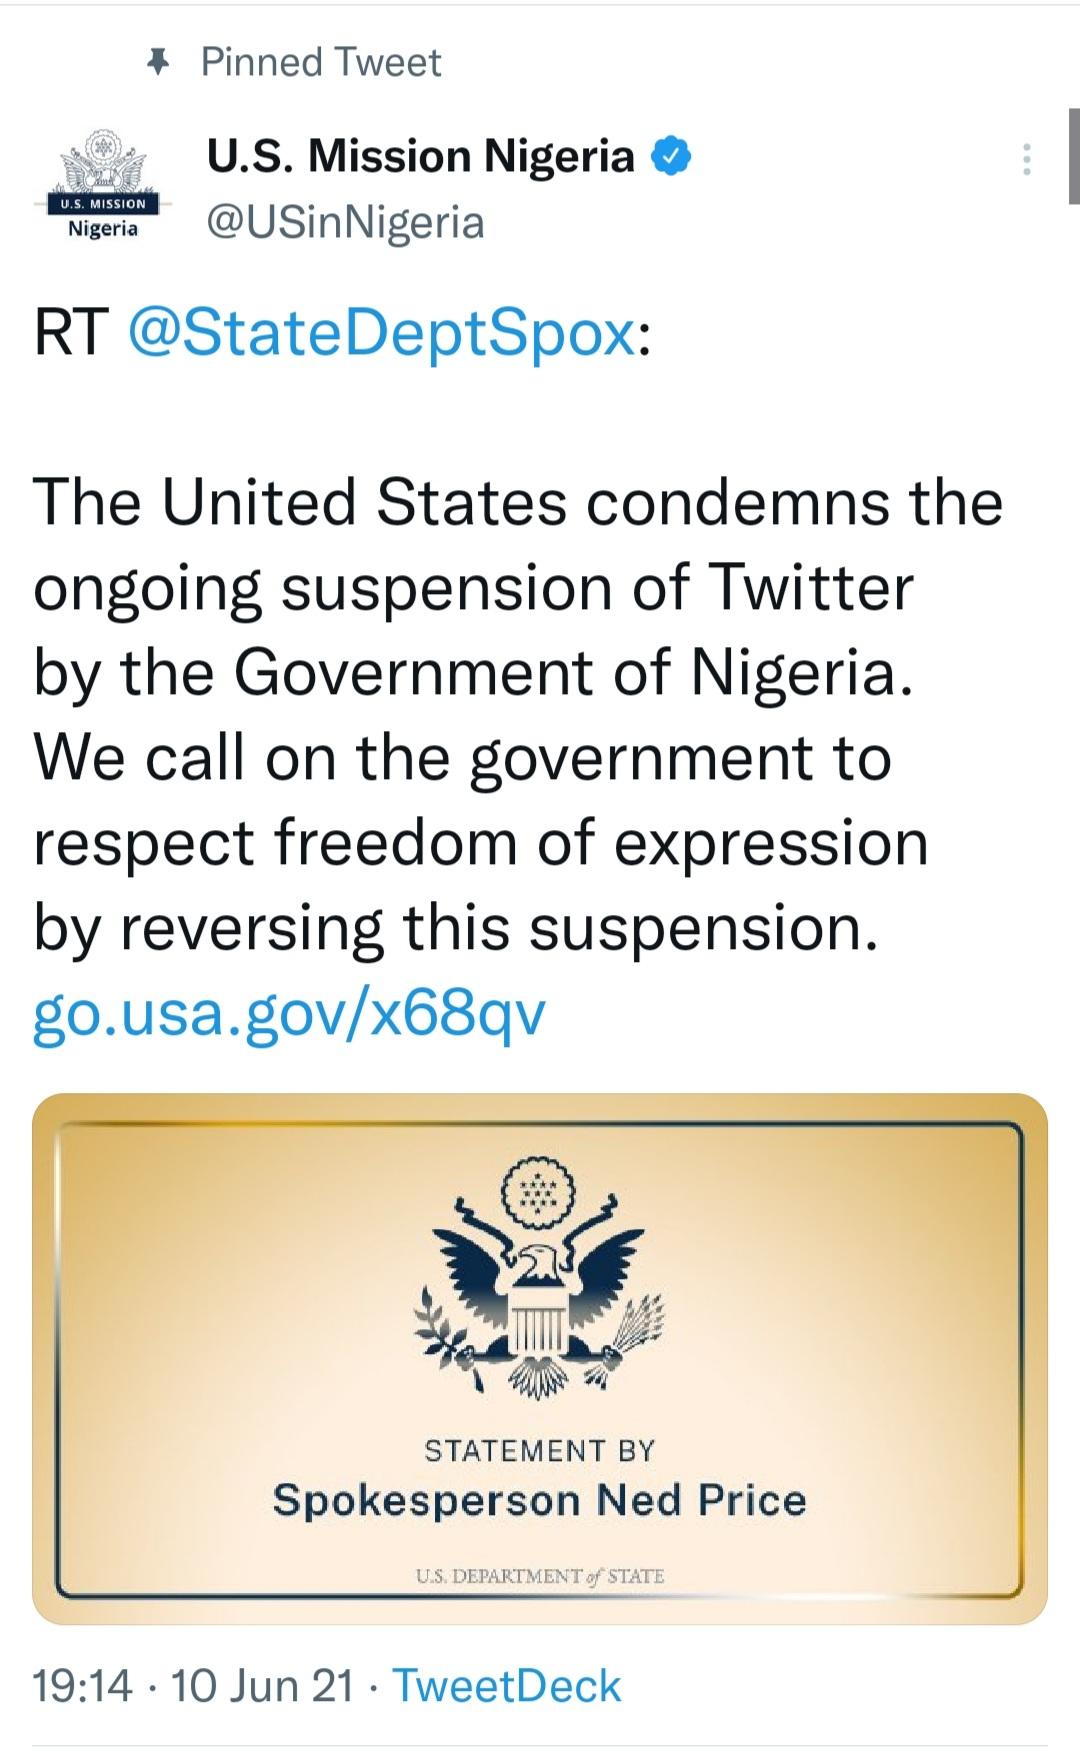 Pinned Tweet condemning Twitter Ban in Nigeria